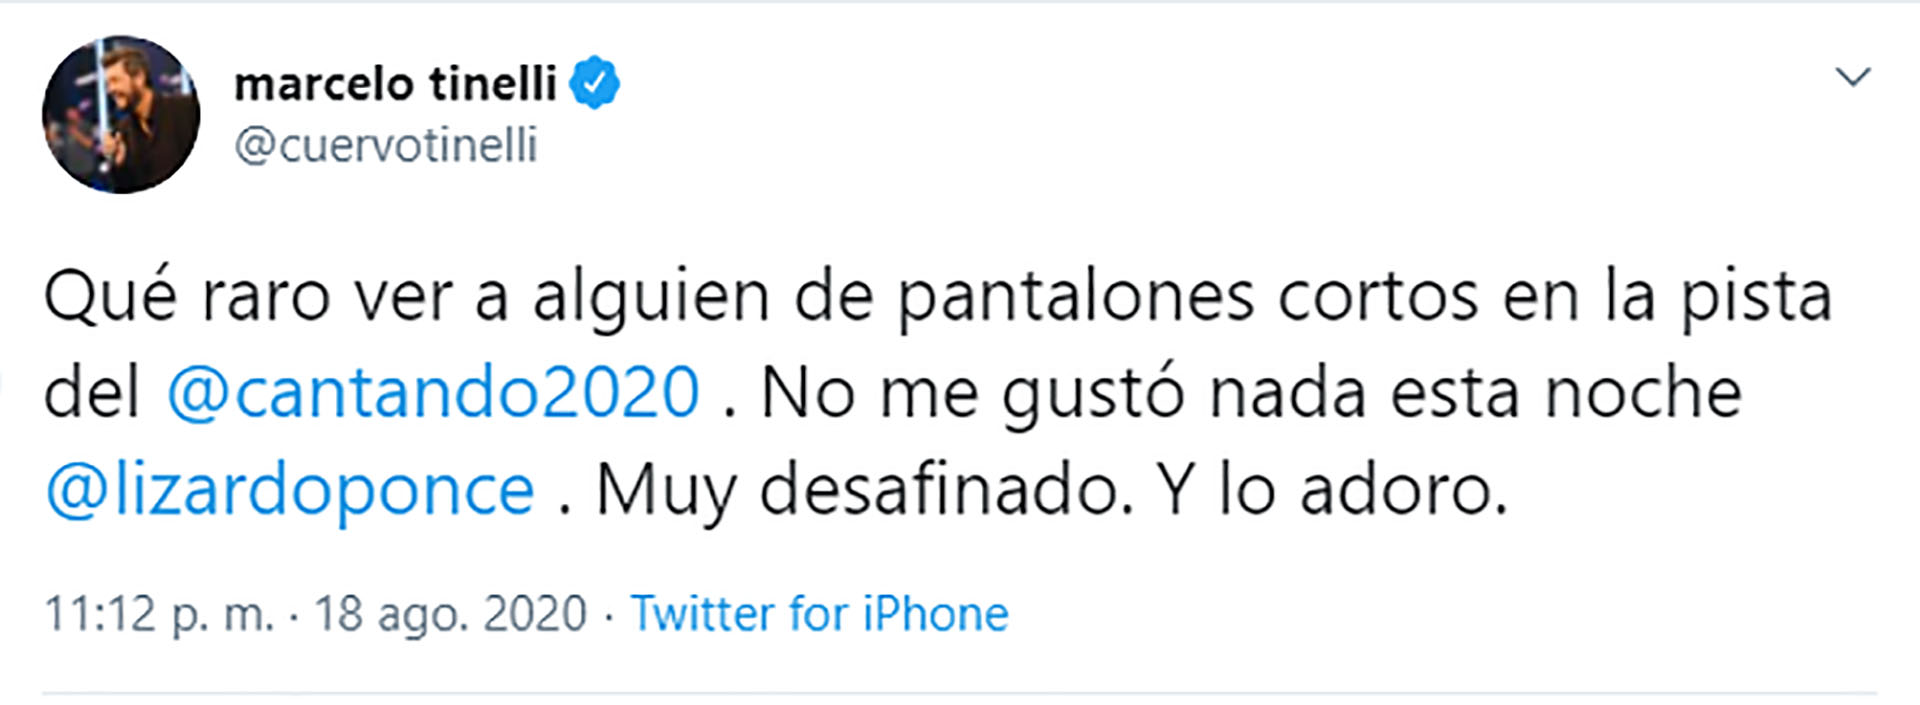 El tuit de Marcelo Tinelli.